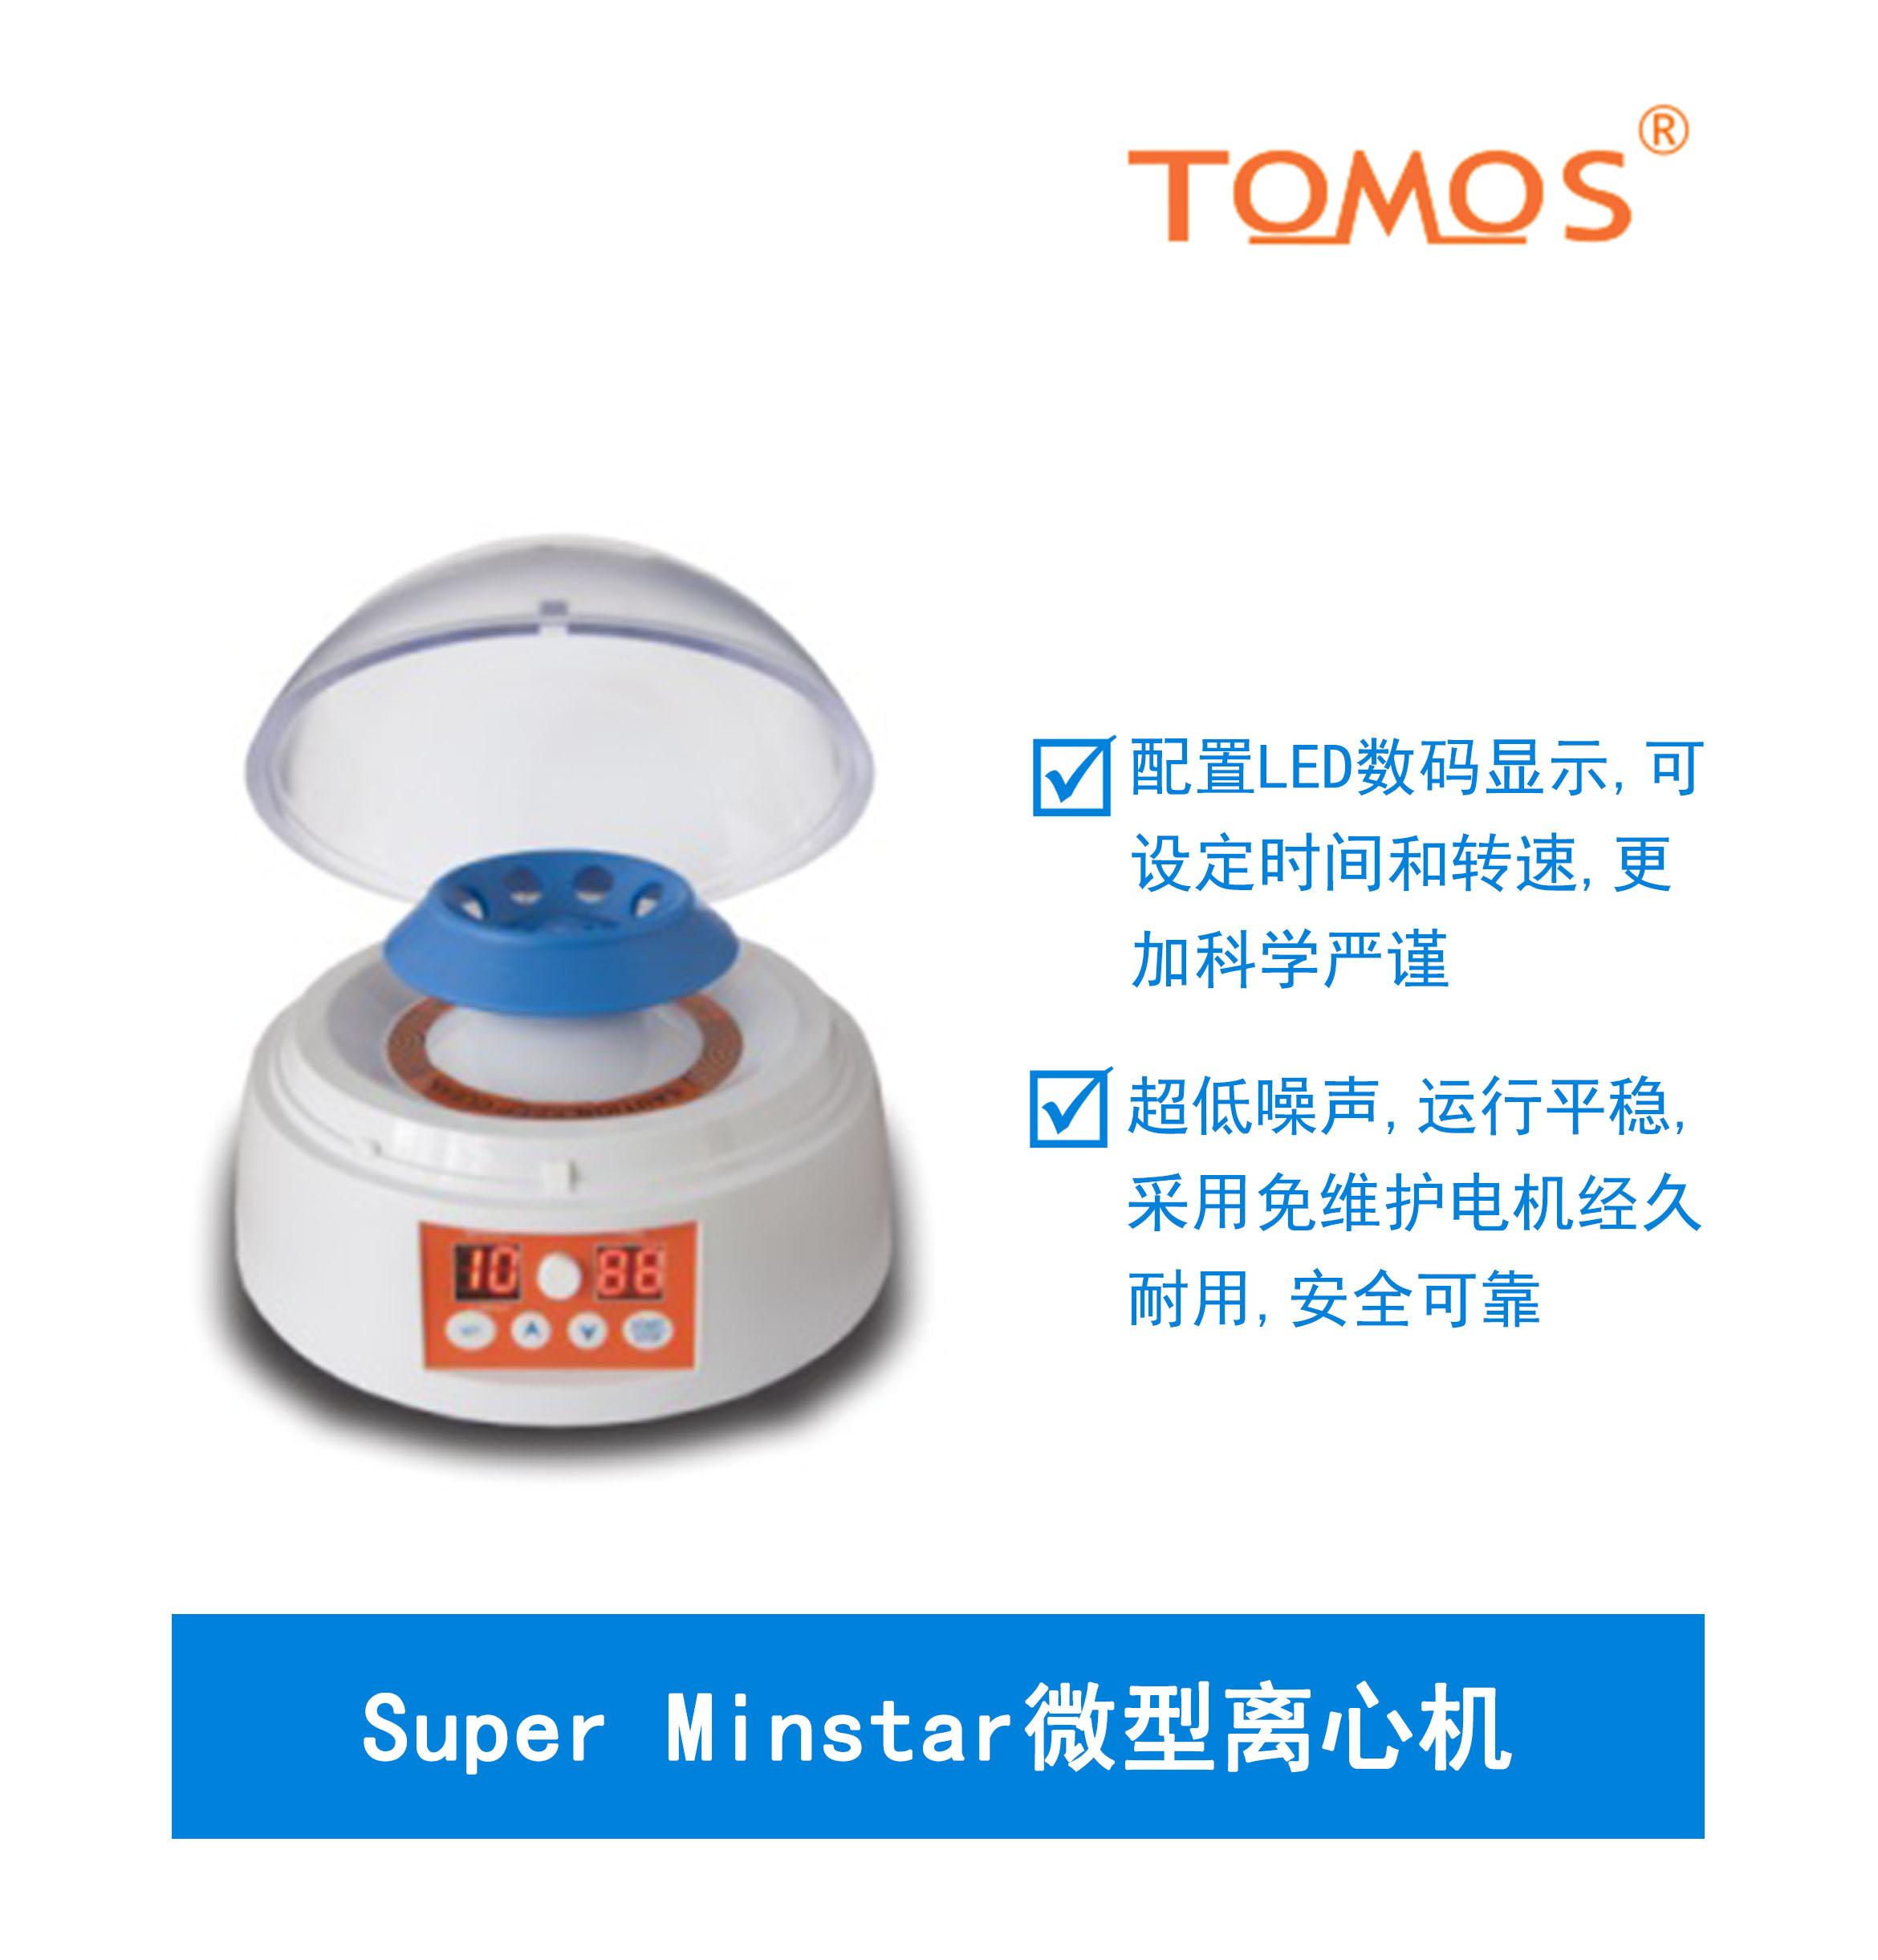 Super Minstar微型离心机